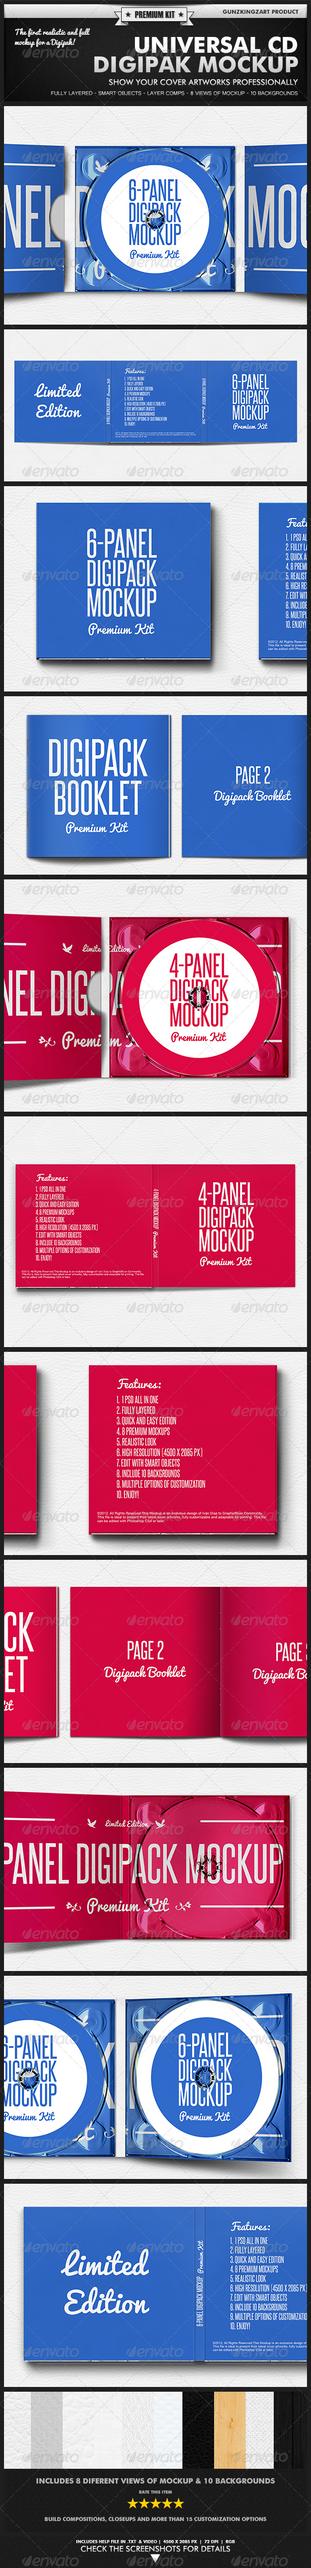 6 Panel Digipak Mockup » Tinkytyler.org - Stock Photos ...